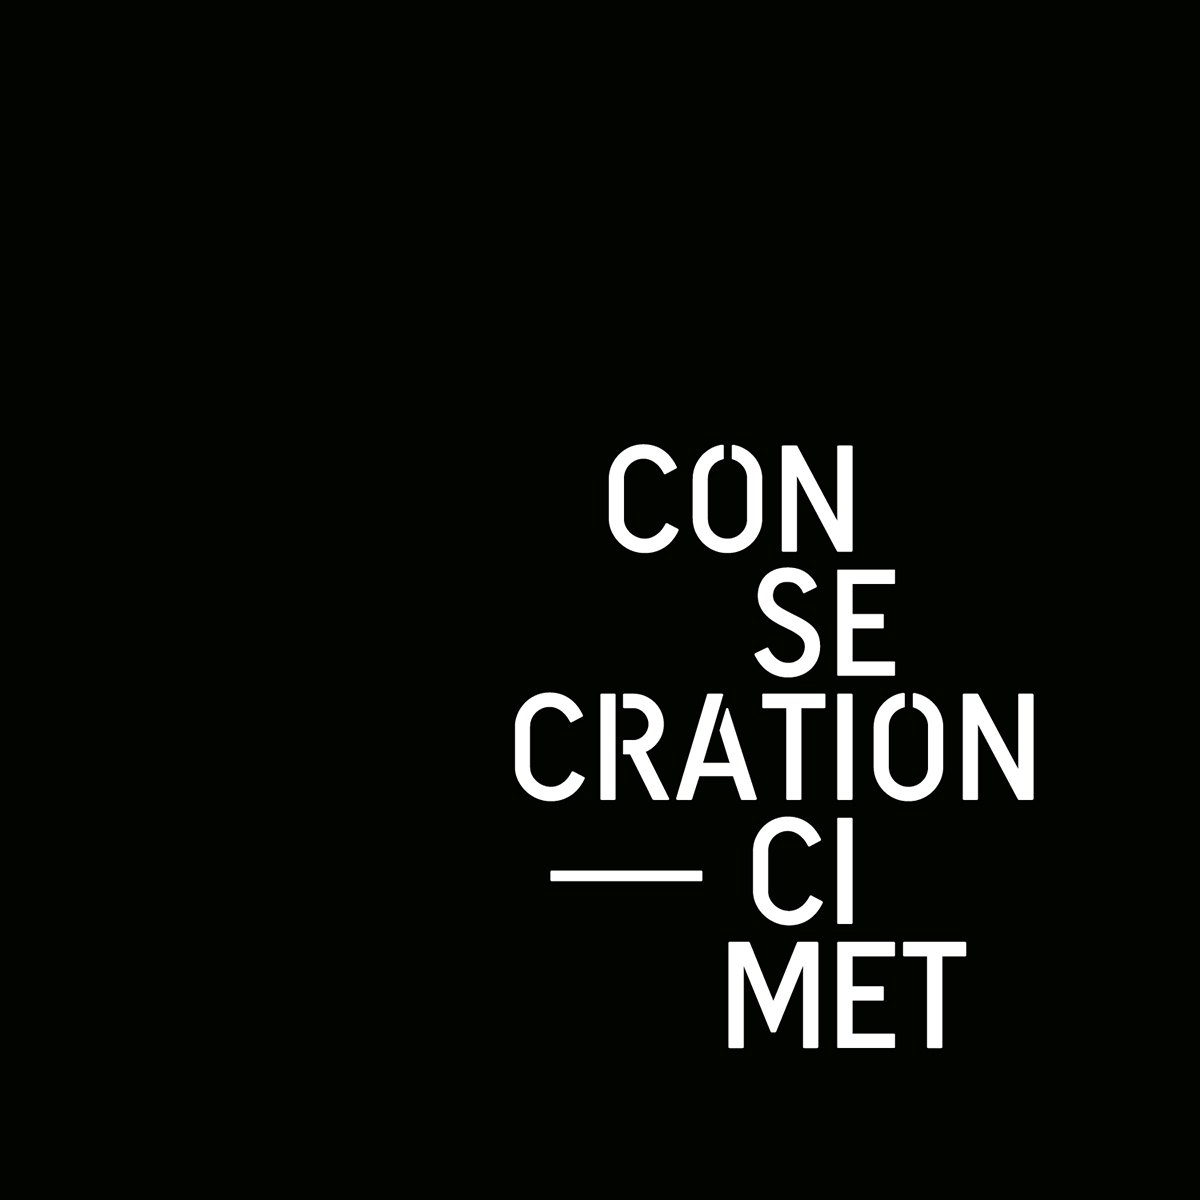 CONSECRATION - Cimet